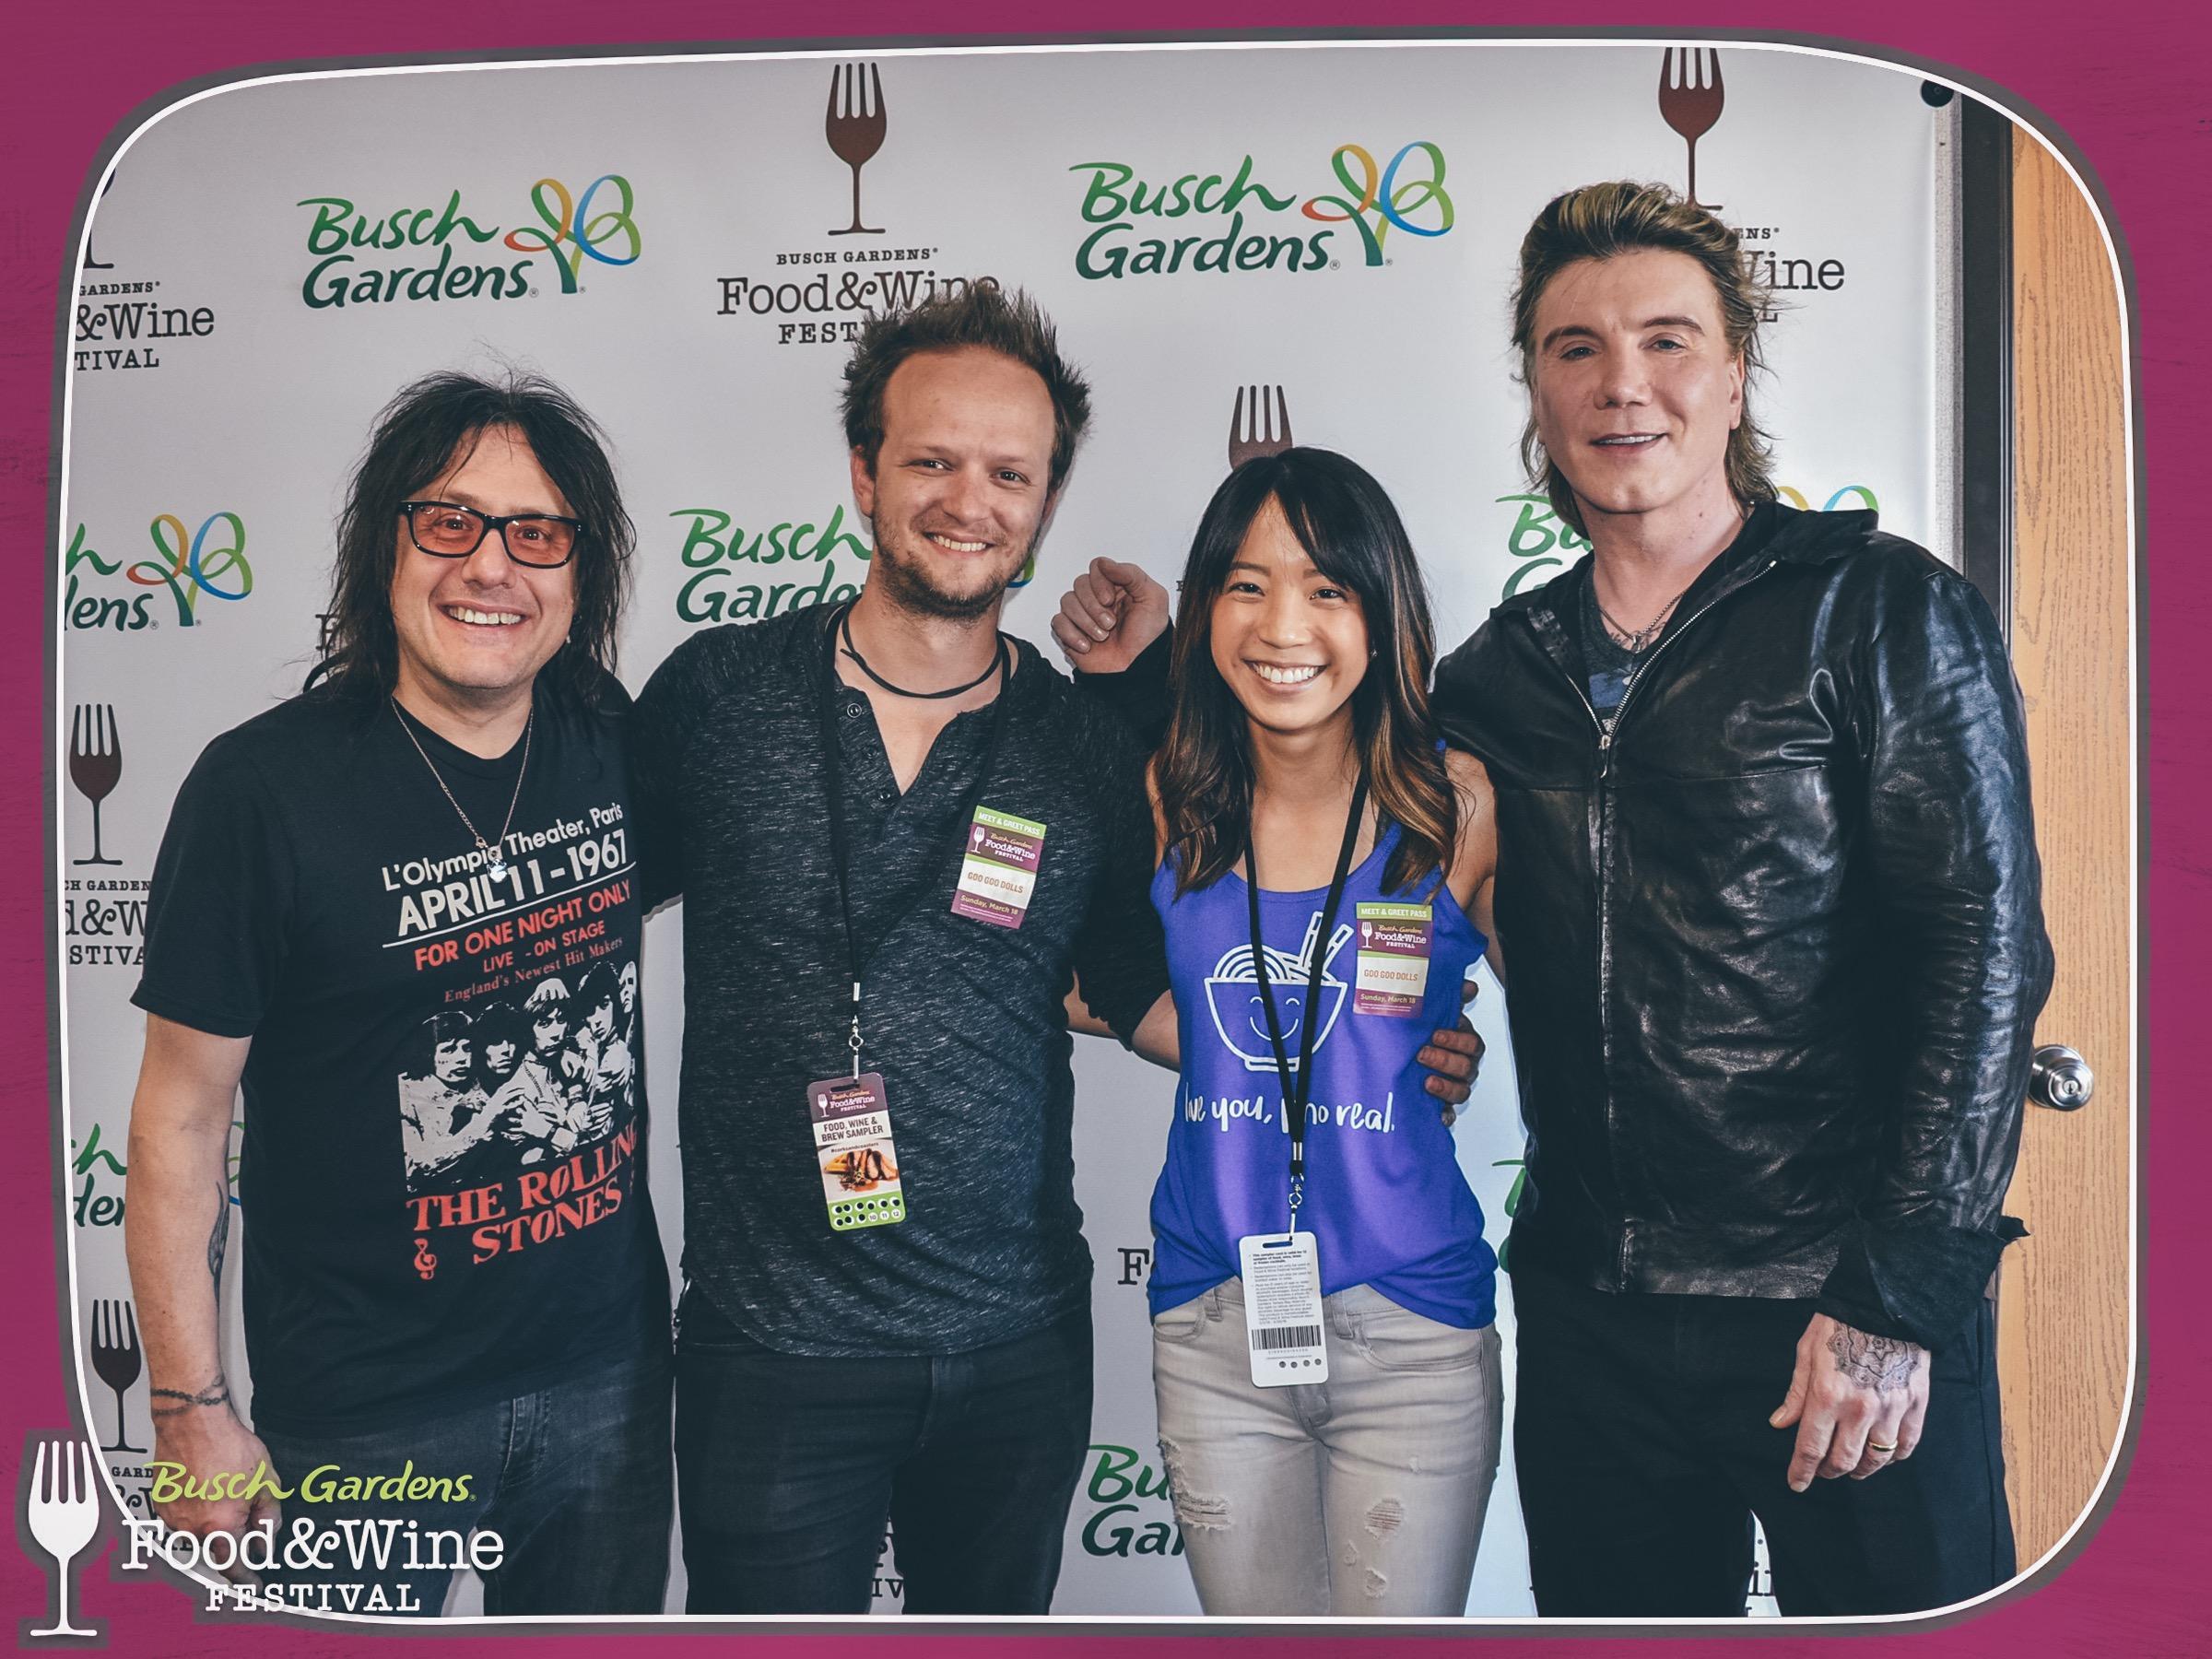 This Jenn Girl - Tampa Blogger - Busch Gardens Food & Wine Festival 7